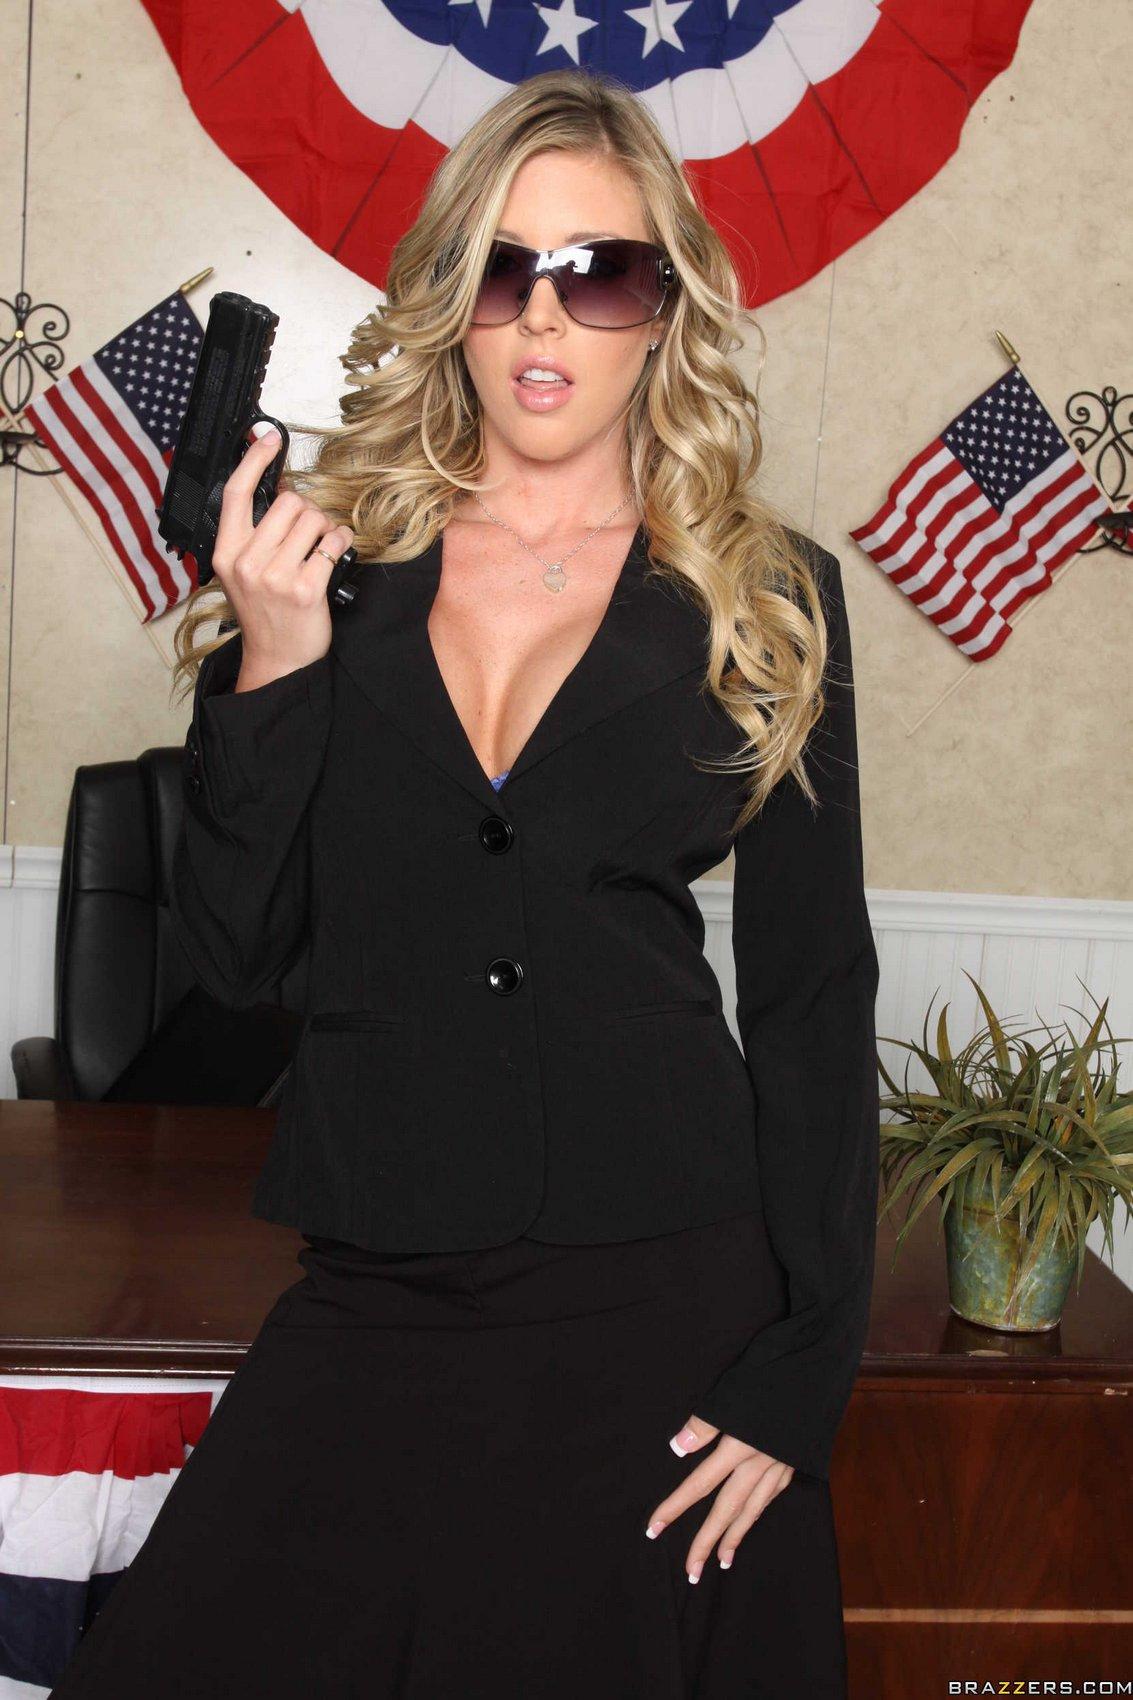 Samantha saint cop